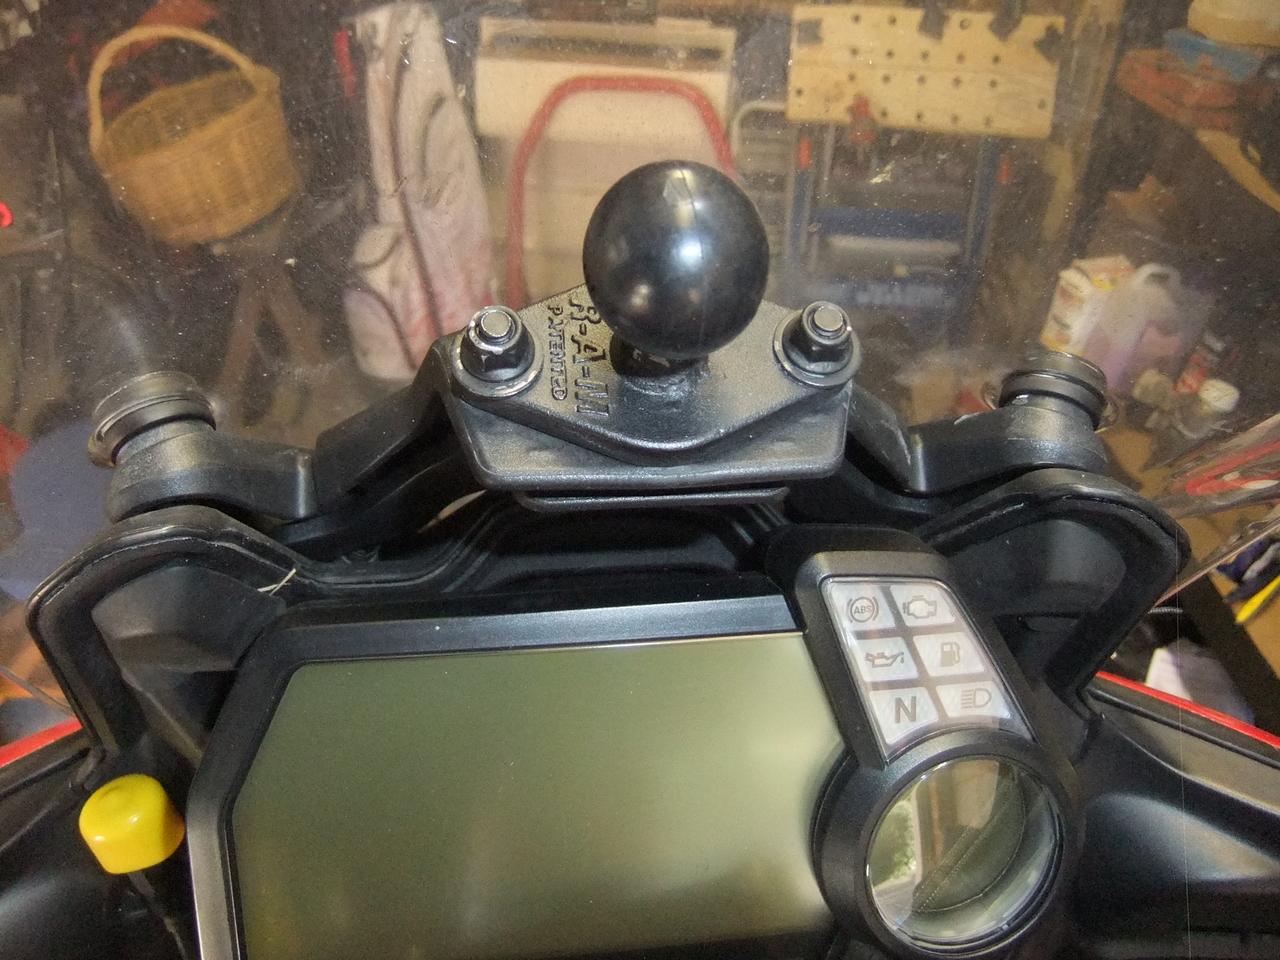 Ram diamond ball mounted on top of the screen adjust frame